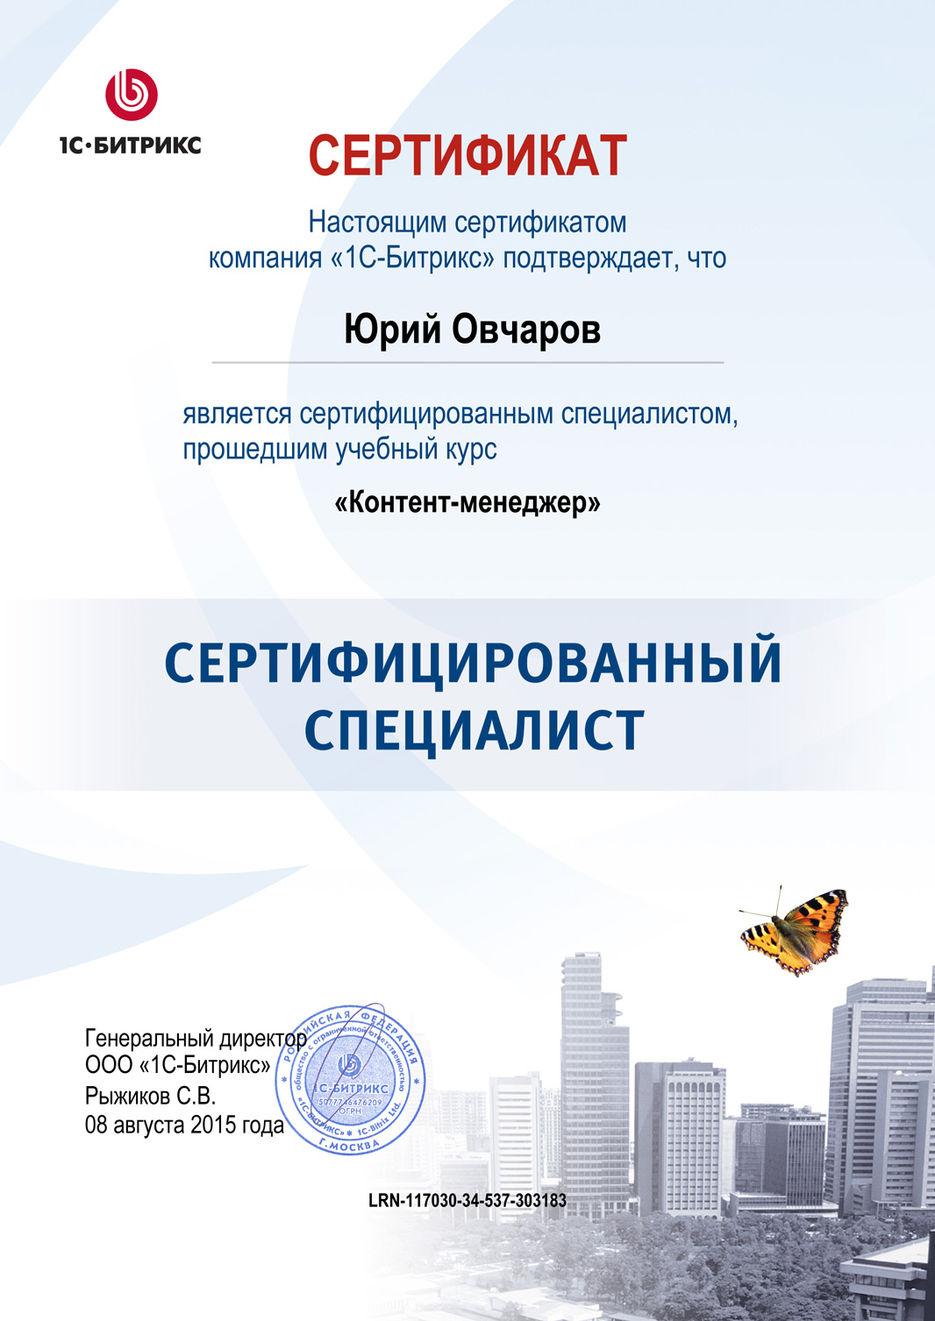 Сертификат контент менеджер битрикс битрикс настройка баннеров